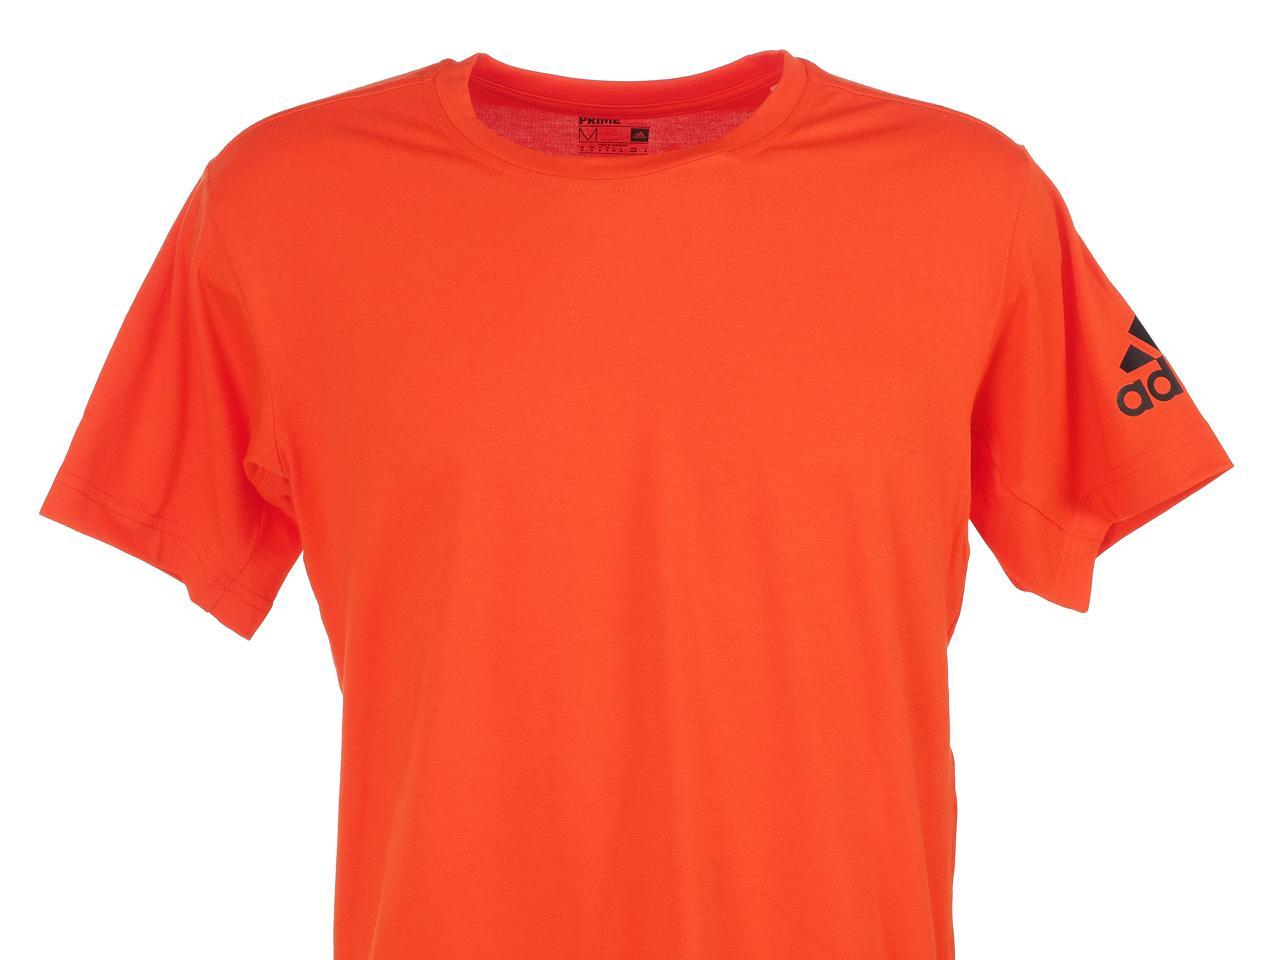 Short-Sleeve-T-Shirt-Adidas-Freelift-Premium-Rge-Mc-Tee-Red-50082-New